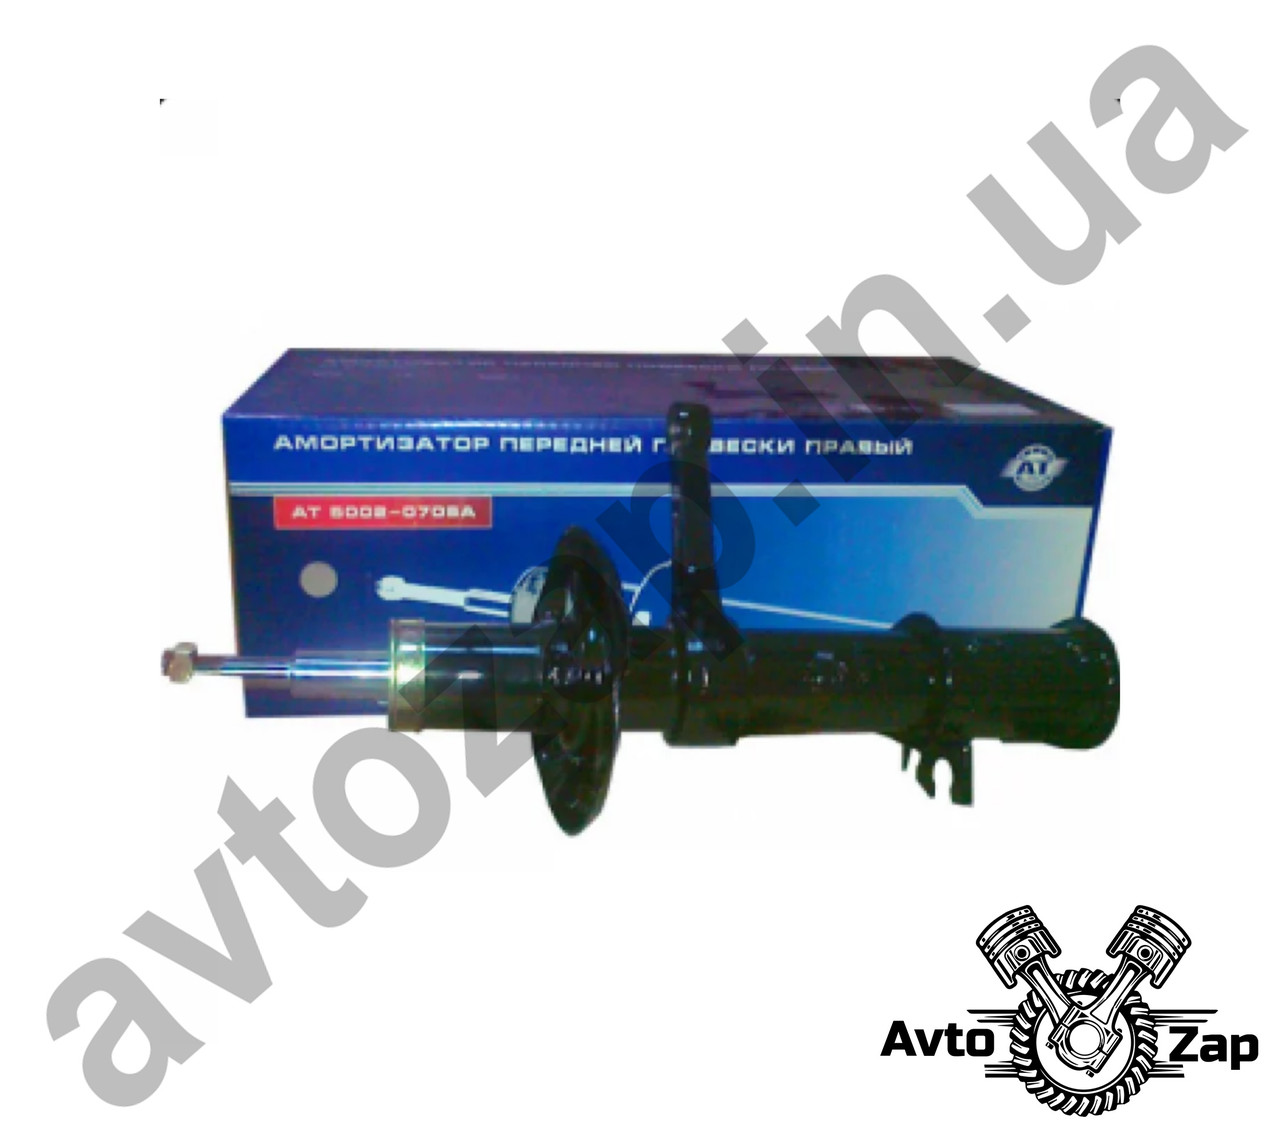 Корпус амортизатора ВАЗ 2108-21099 перед. правый.     376